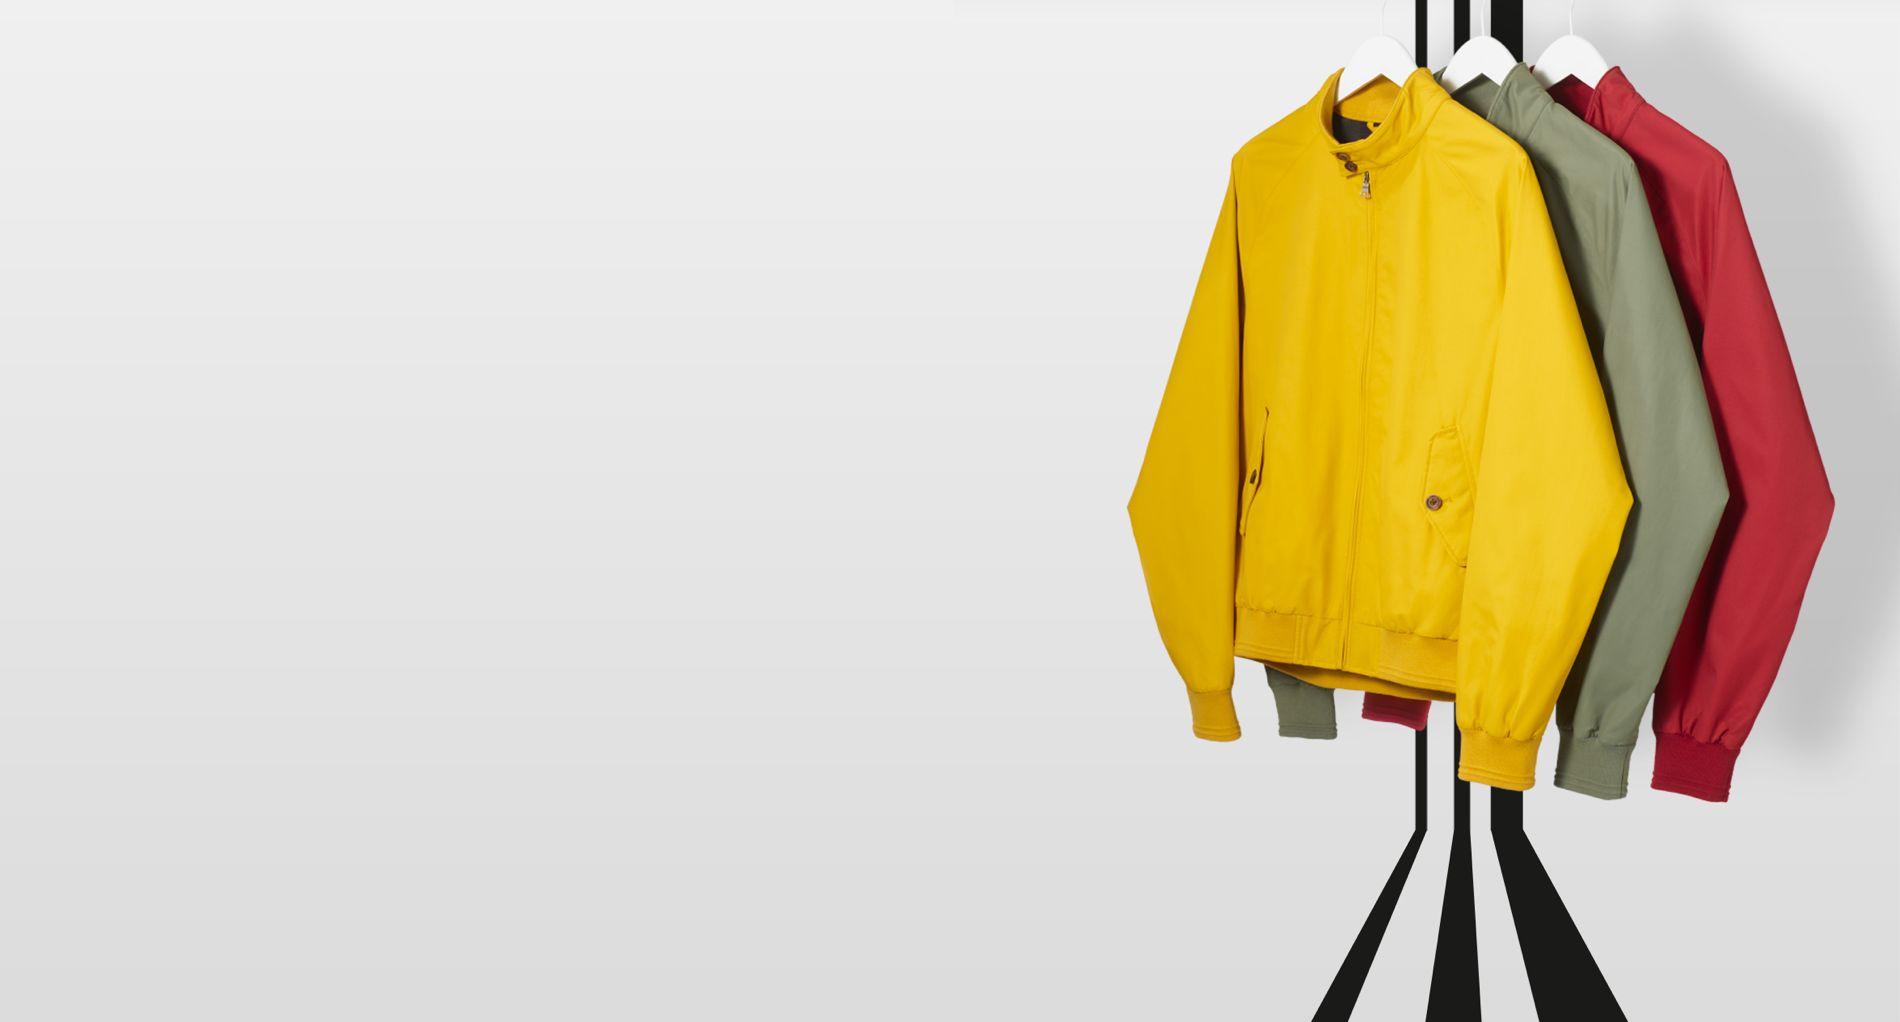 5d4fc6357 John Lewis & Partners   Homeware, Fashion, Electricals & More